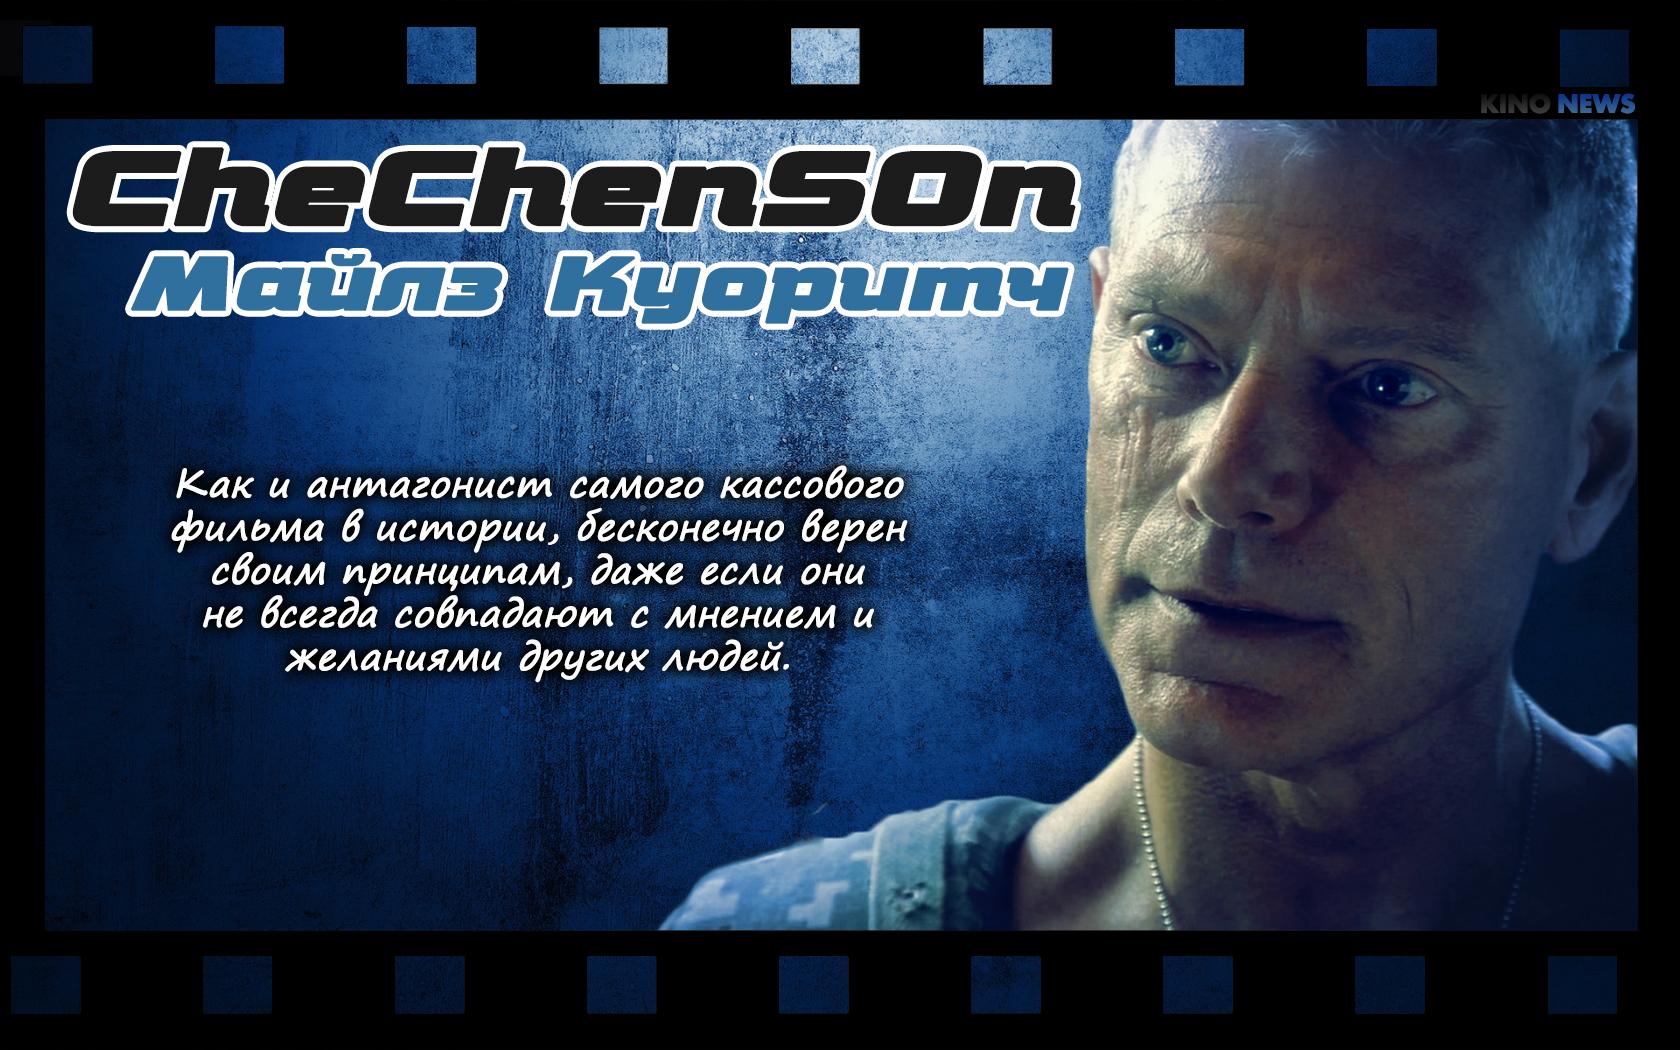 https://www.kinonews.ru/insimgs/2017/persimg/persimg77944_7.jpg